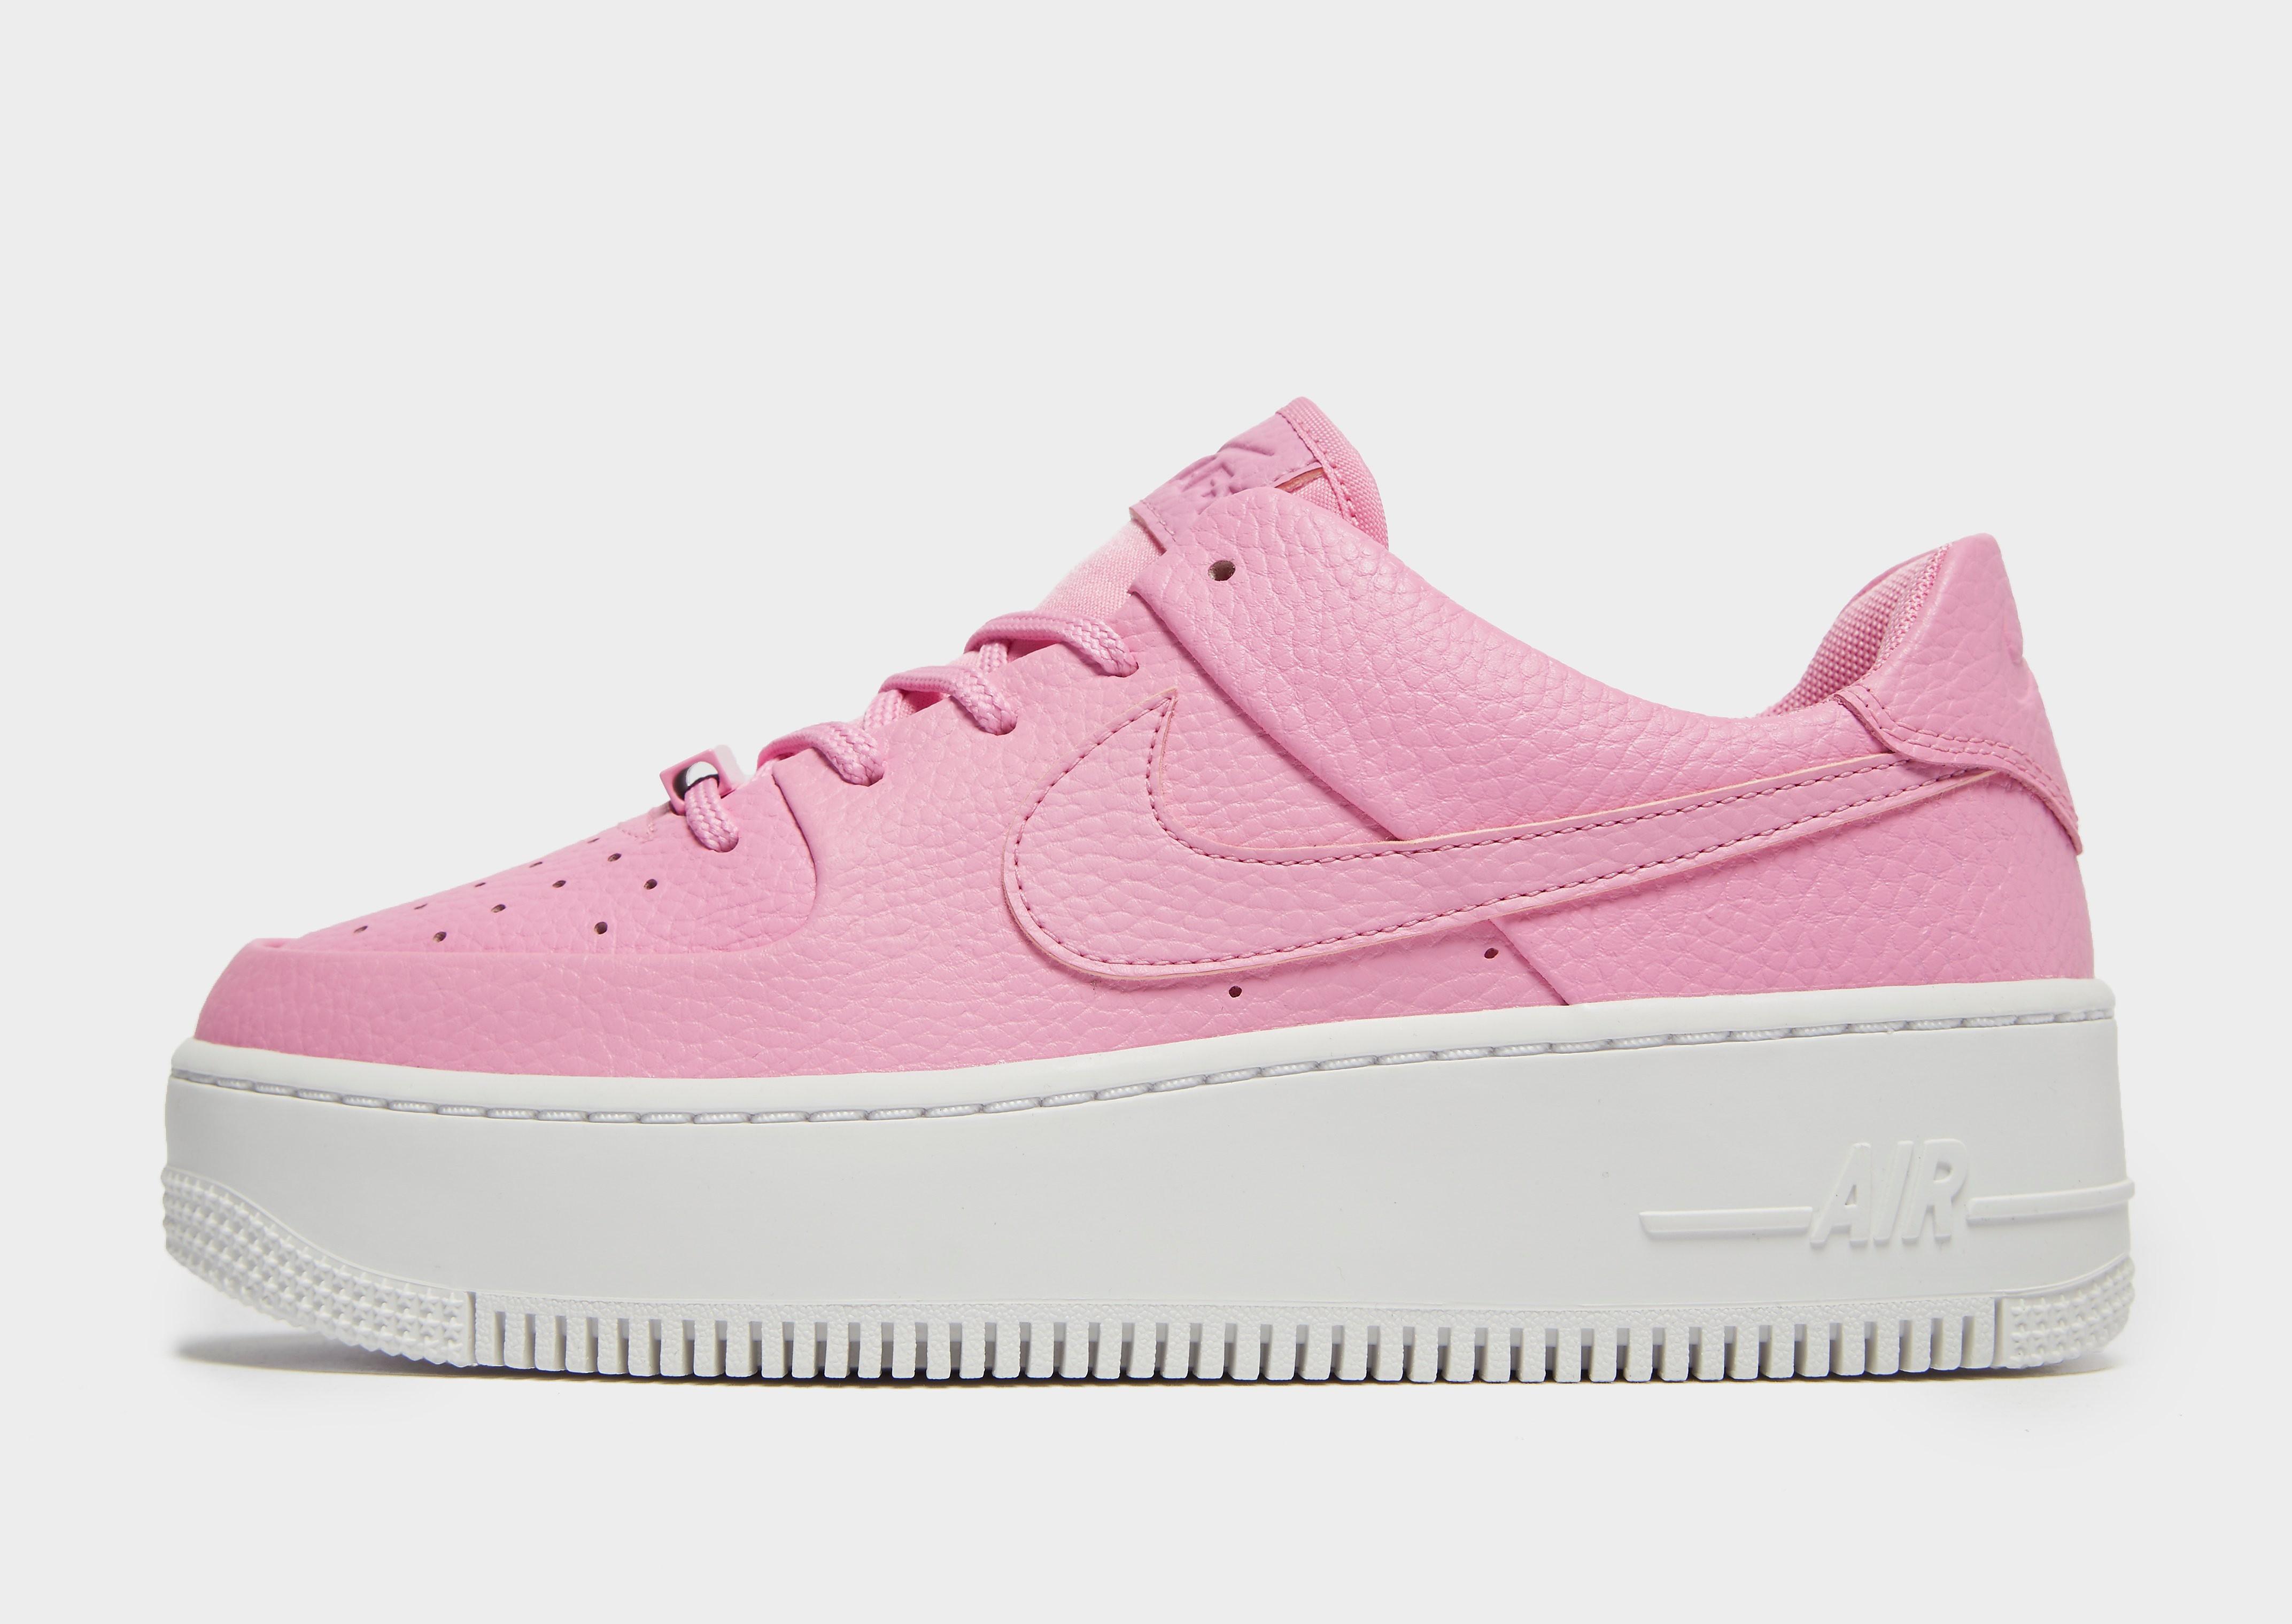 Nike Air Force 1 Sage Low Femme